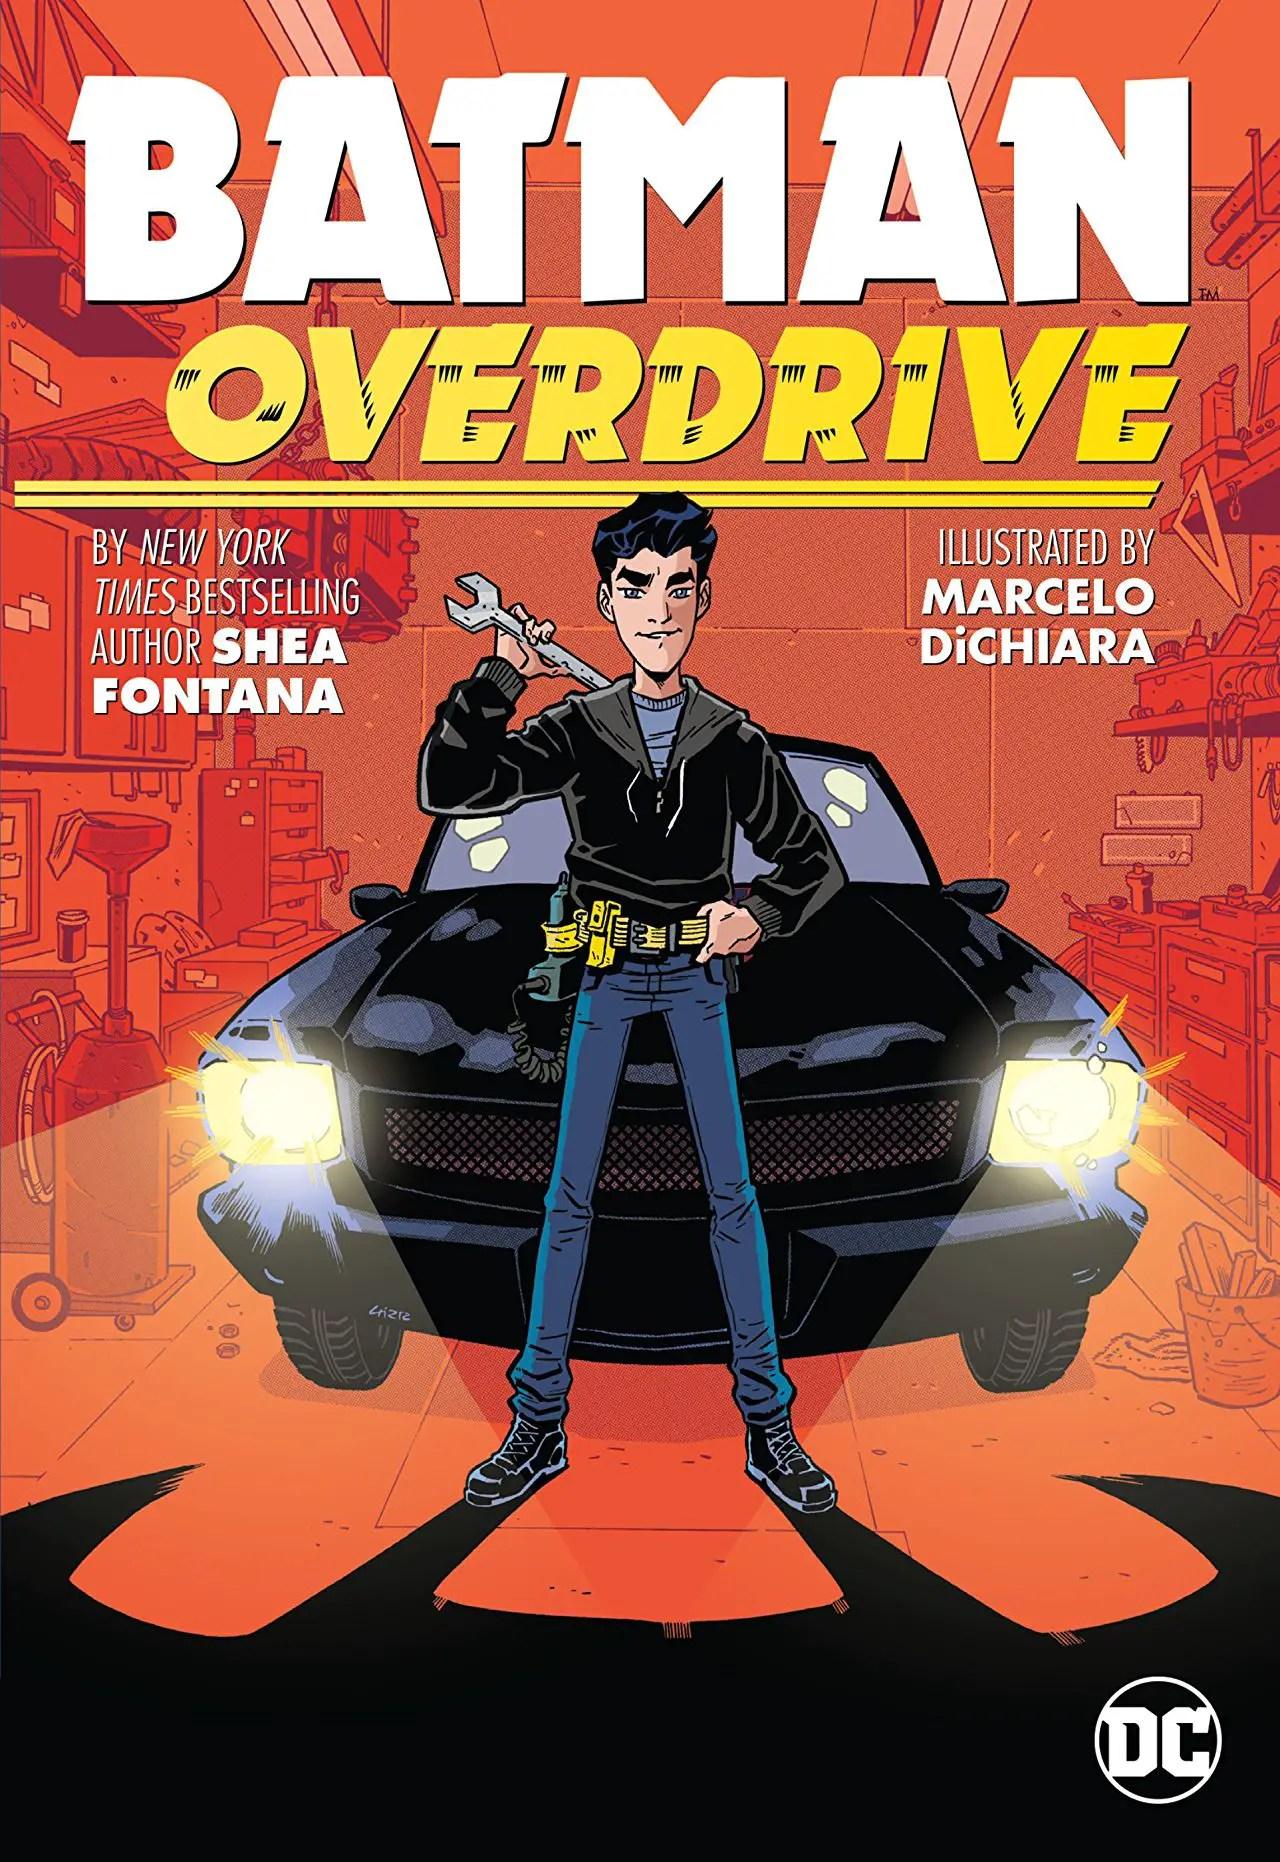 Batman: Overdrive Review